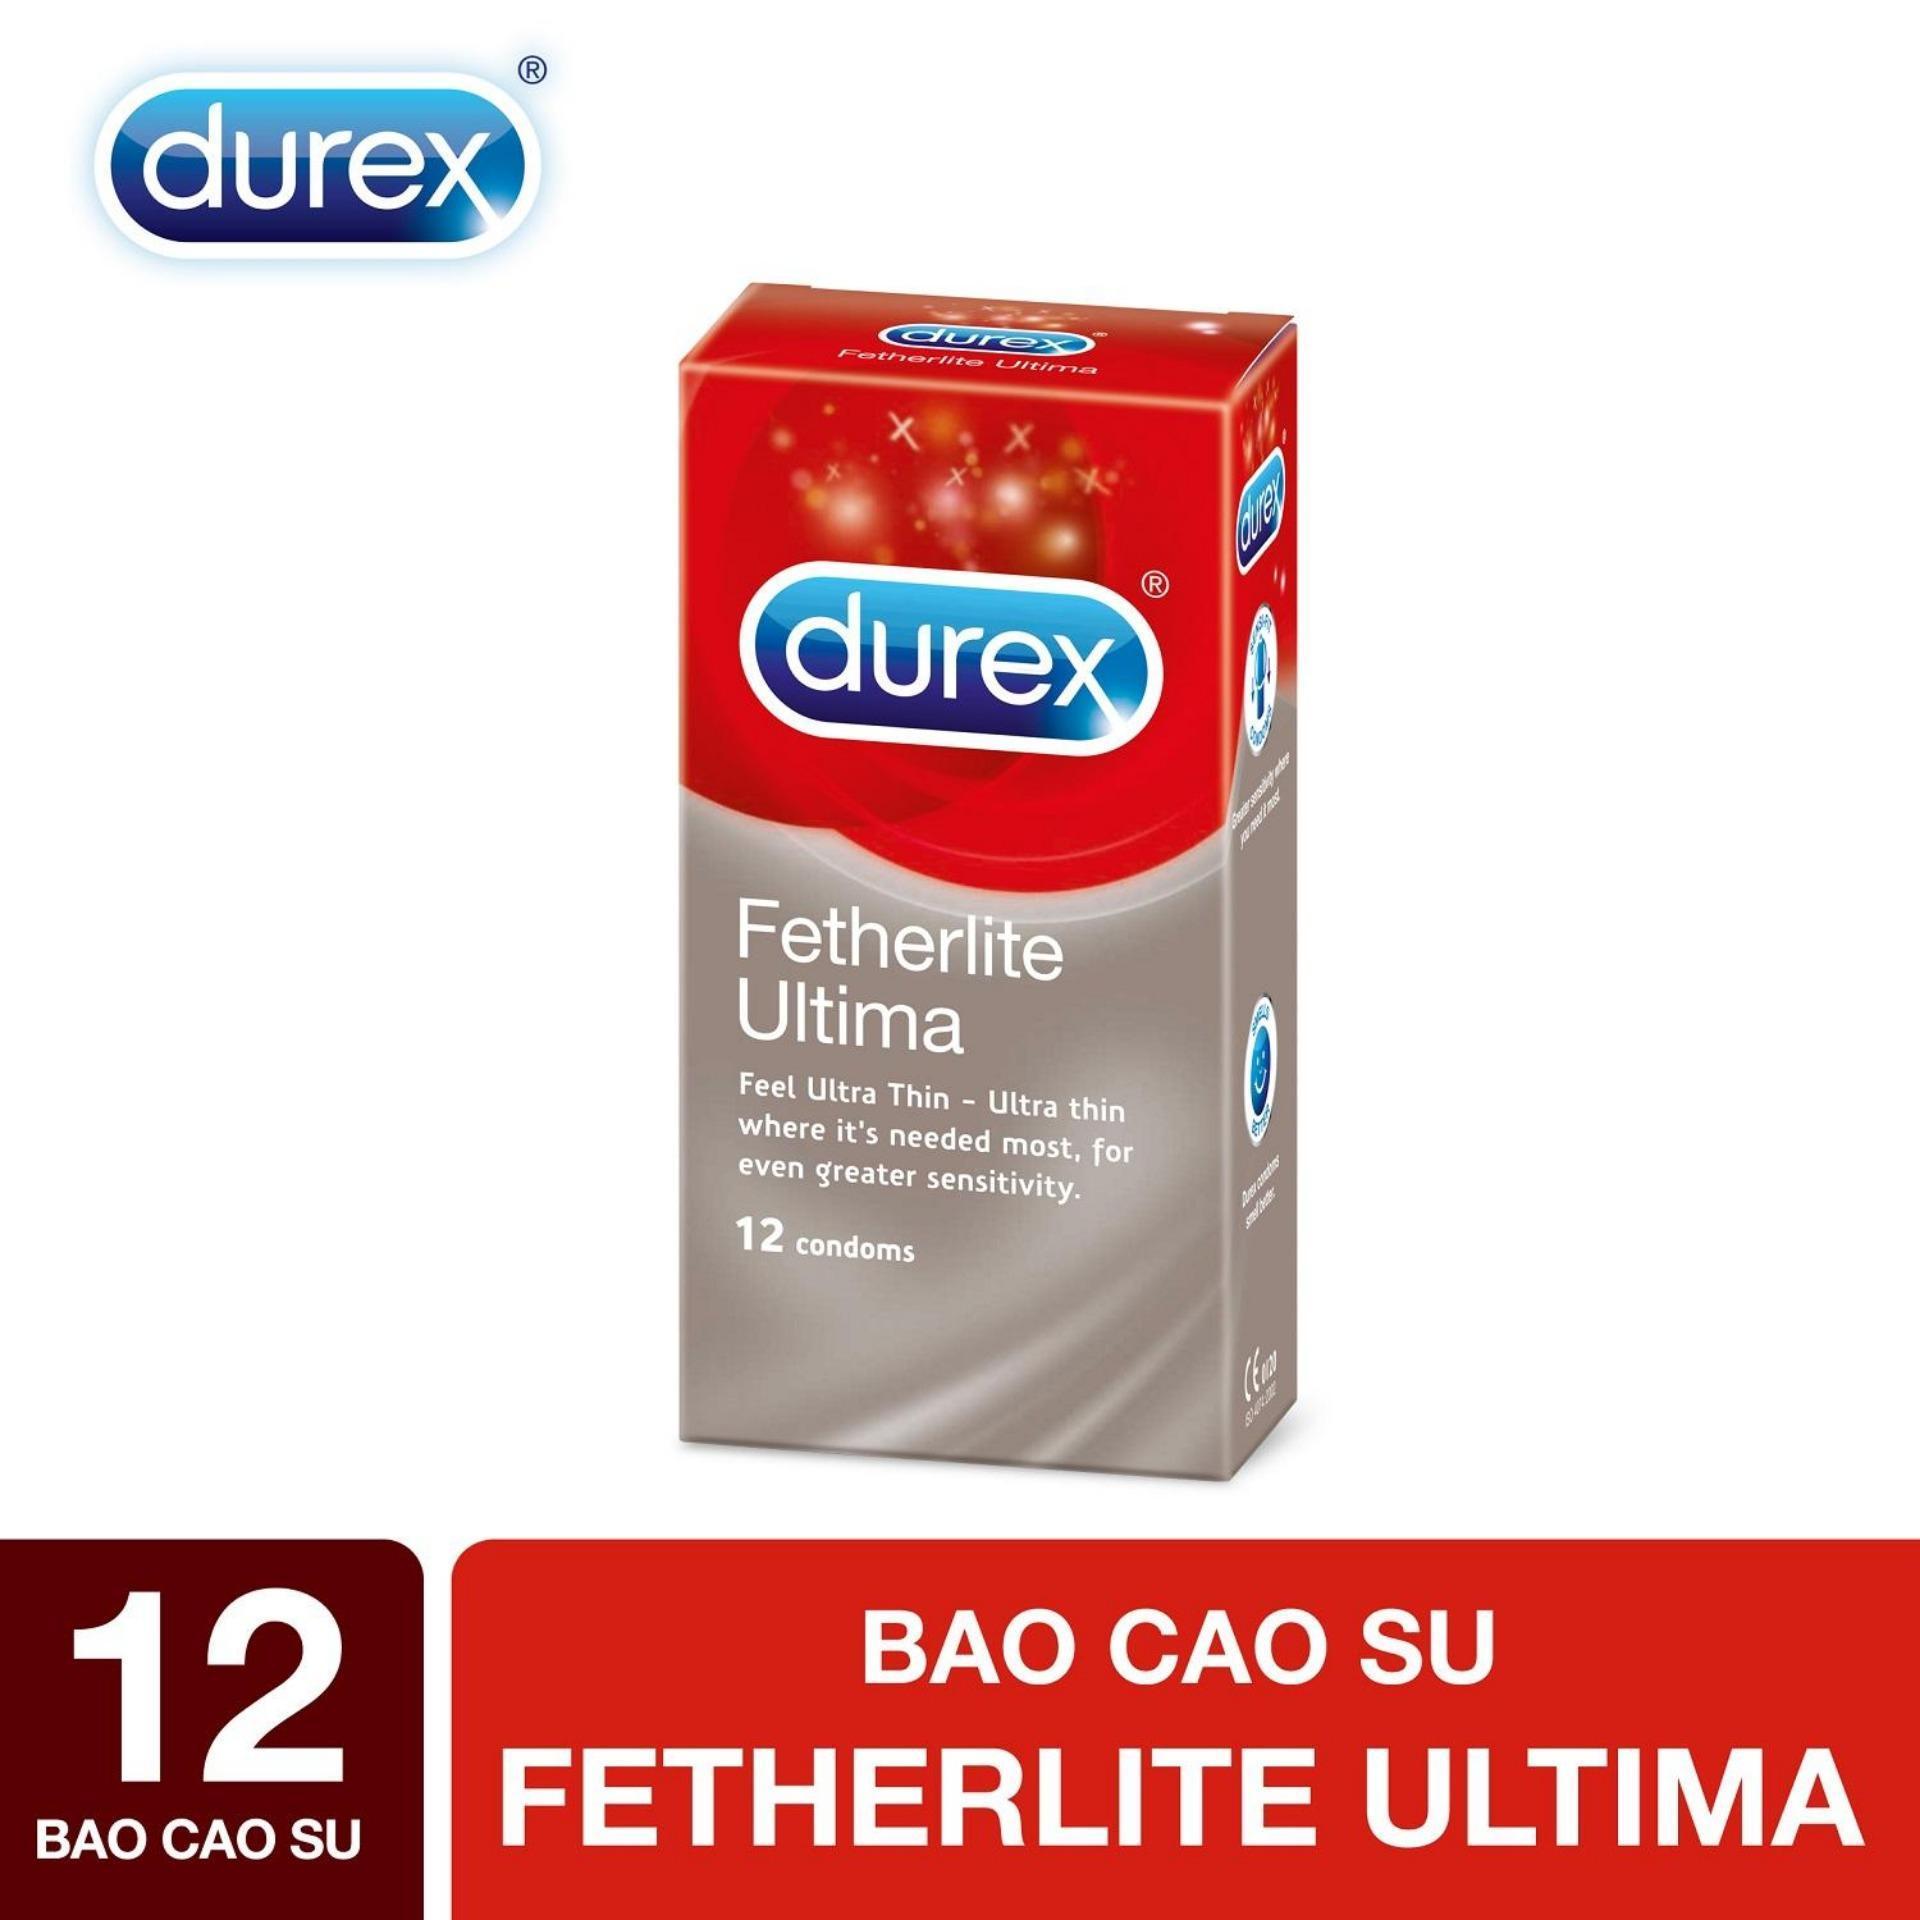 Bao Cao Su Durex Fetherlite Ultima Siêu Mỏng 12 Condoms chính hãng